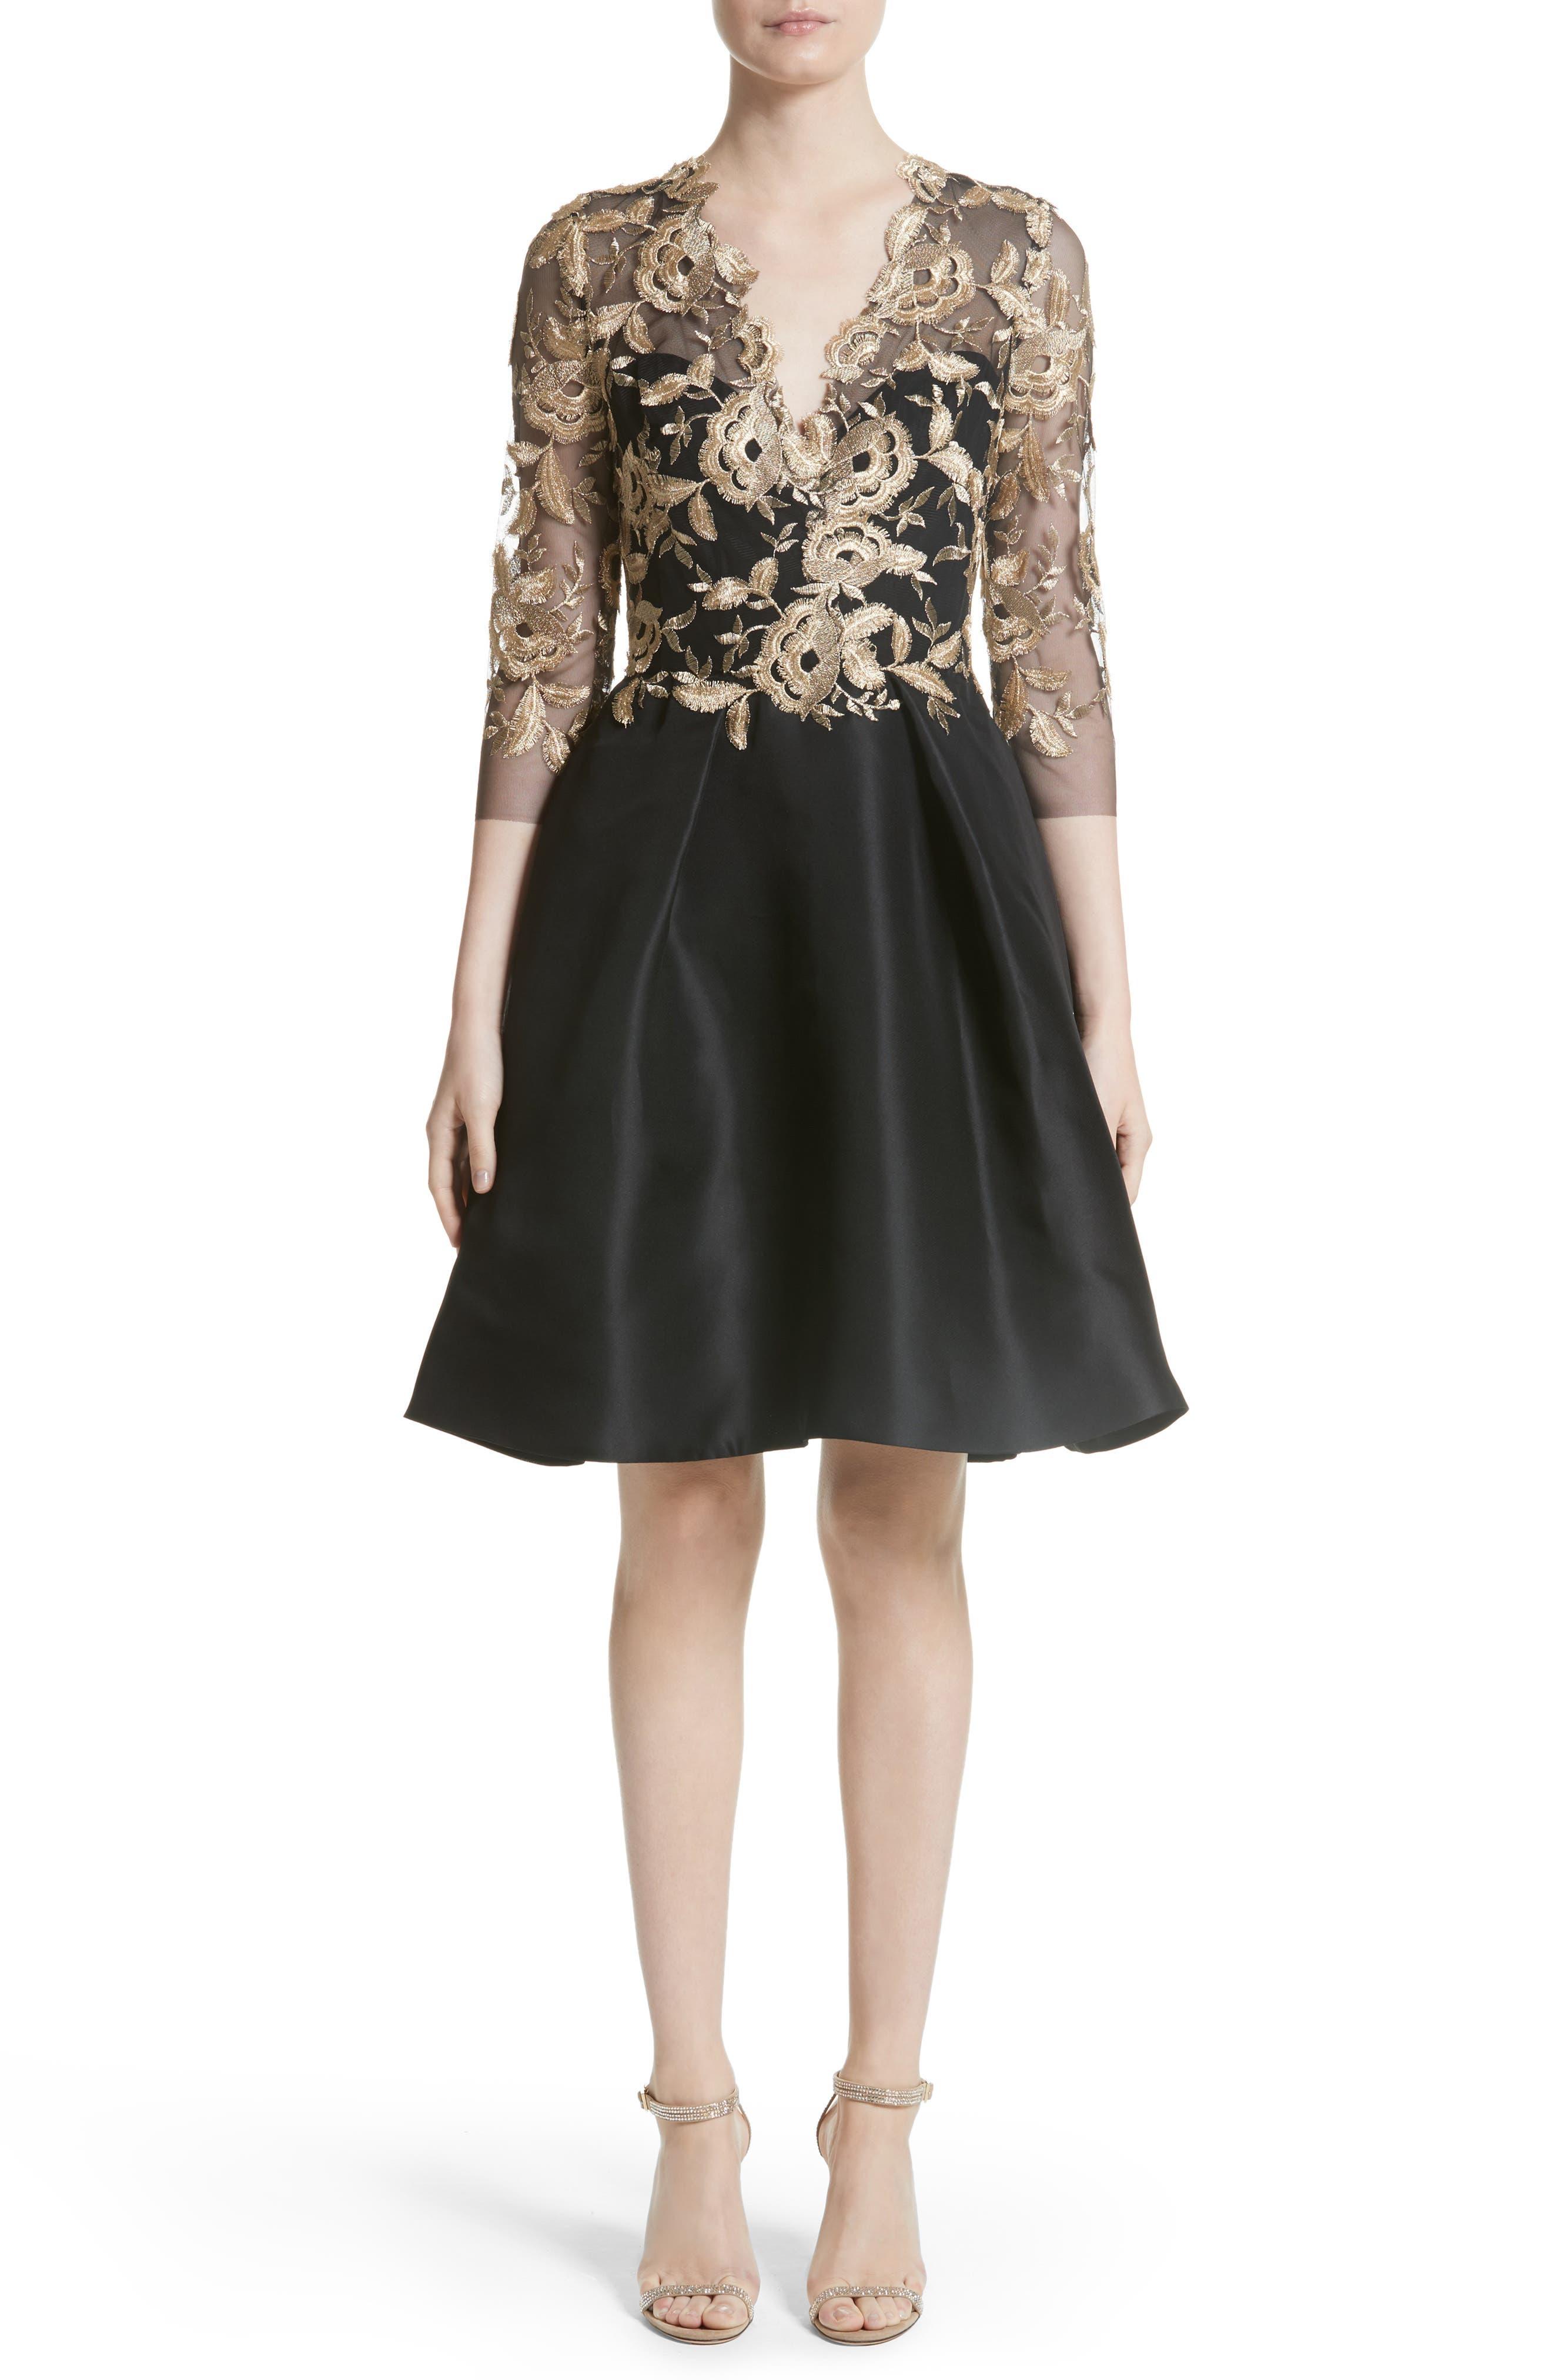 Monique Lhuillier Embroidered Gazar Fit & Flare Dress